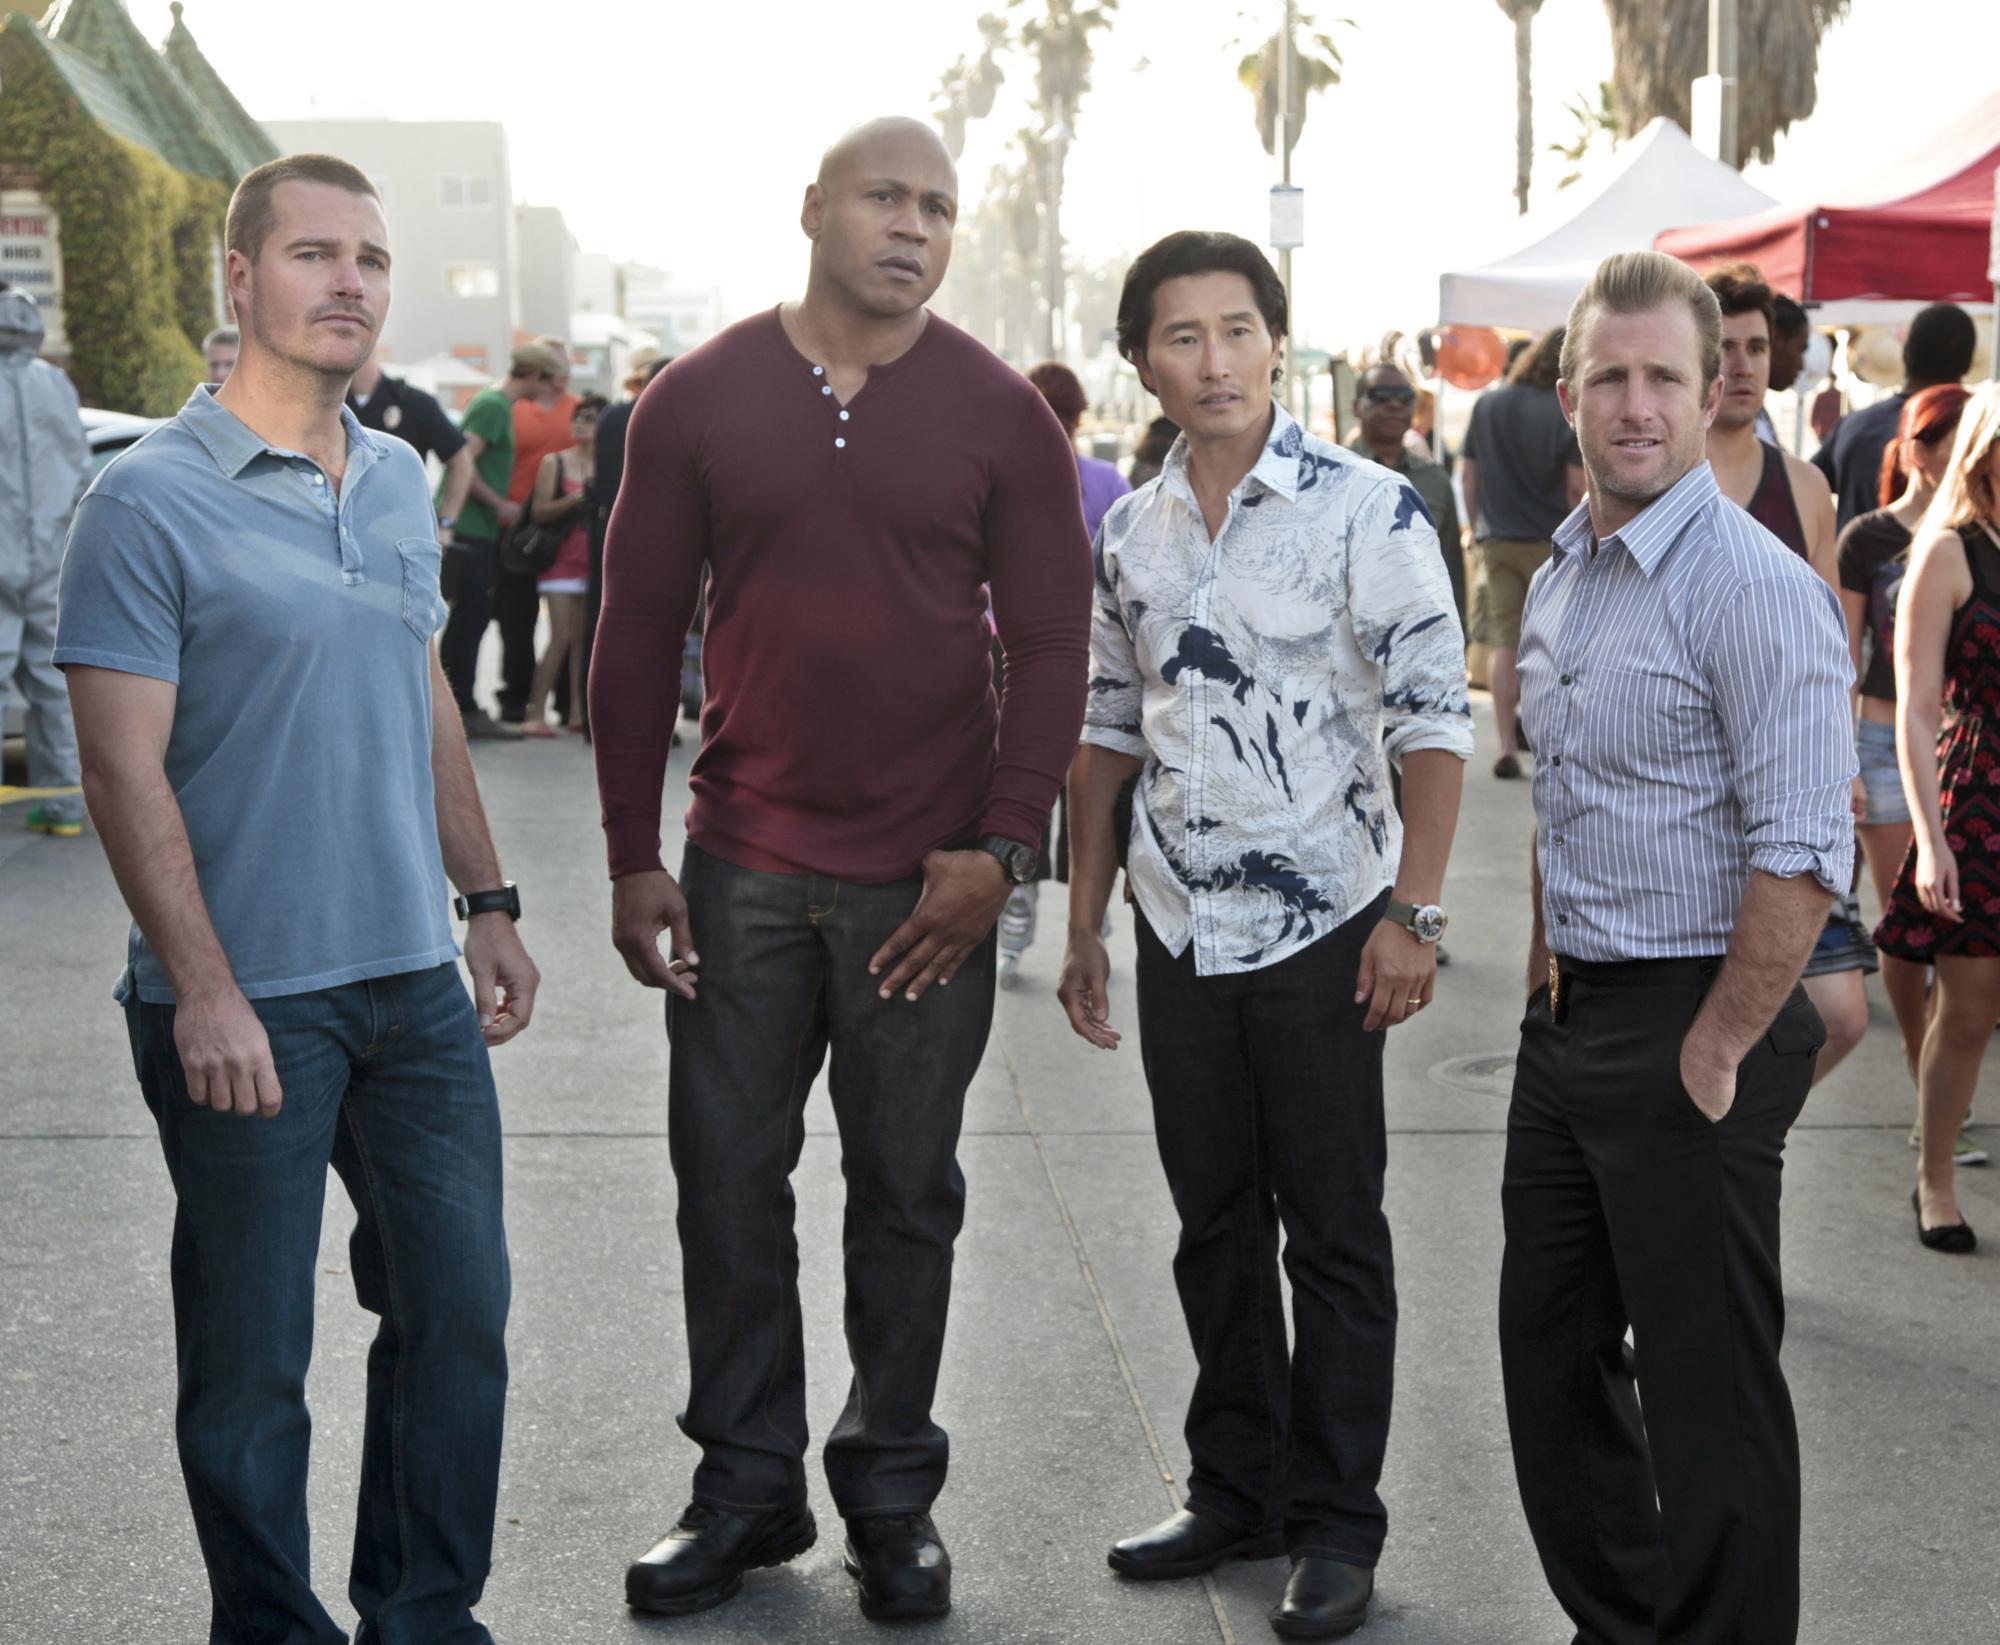 G. Callen, Sam Hanna, Chin Ho Kelly and Danny Williams